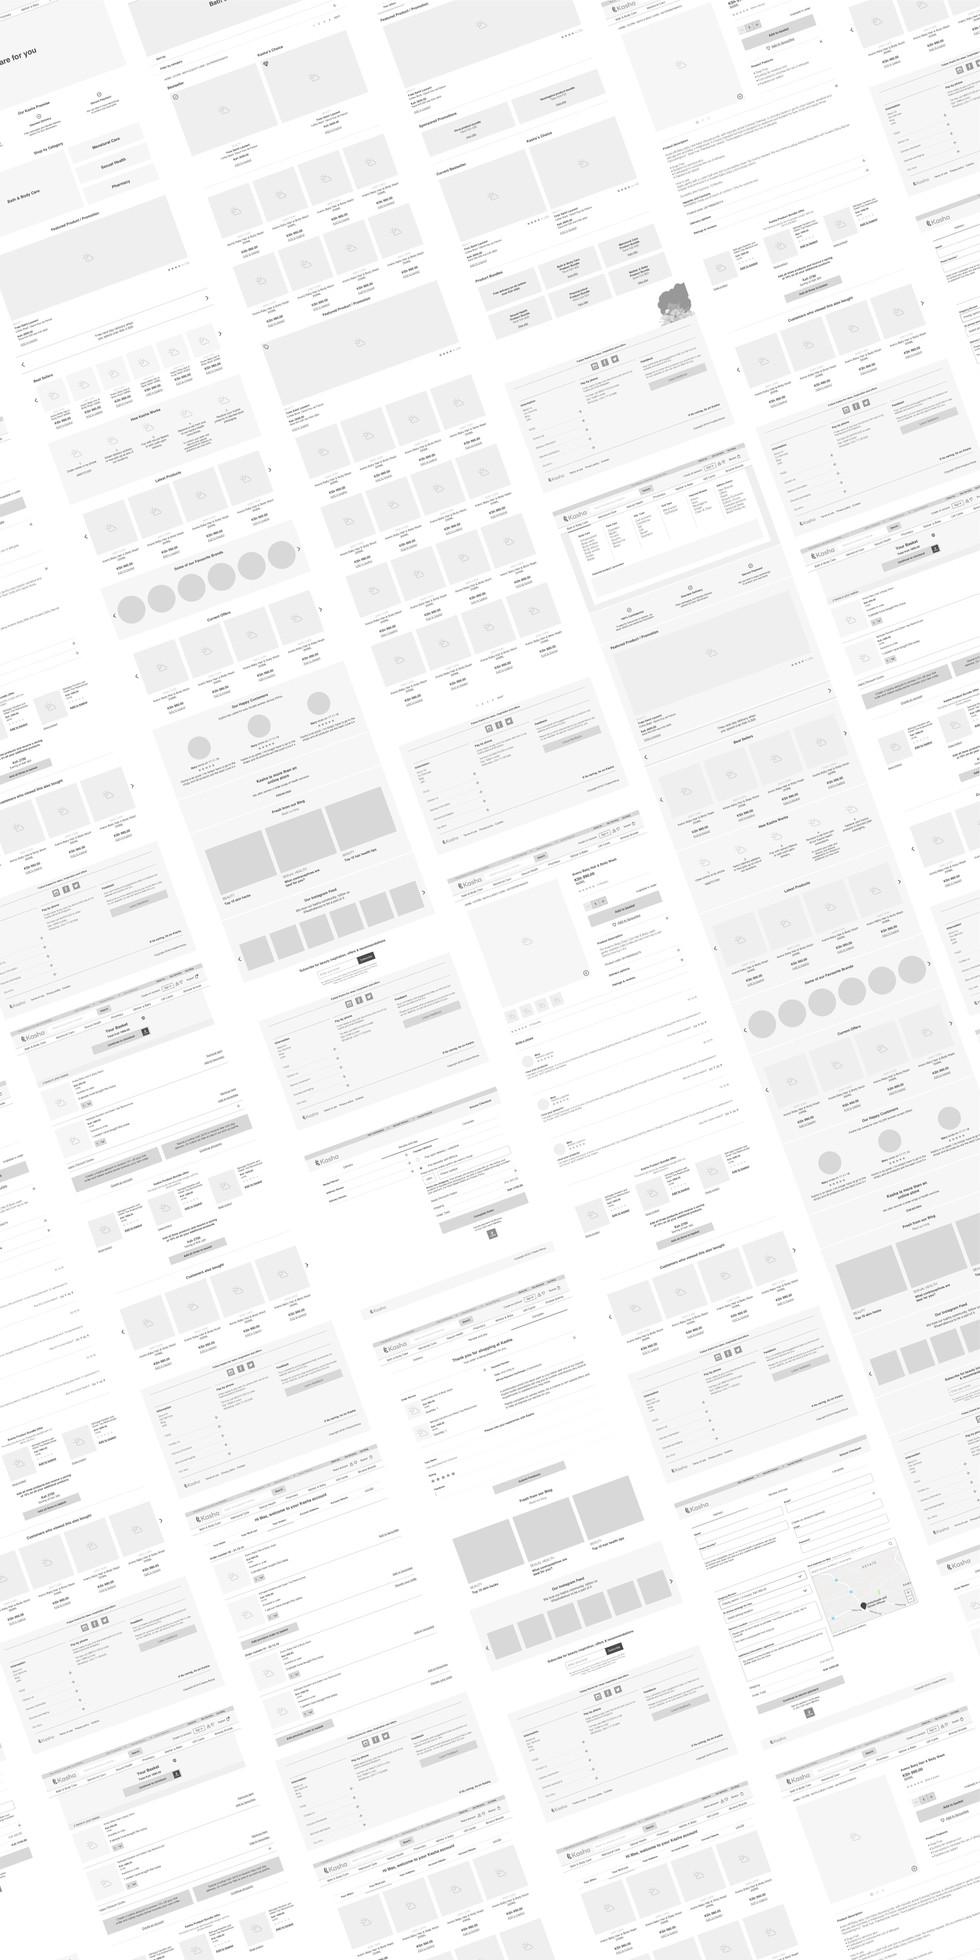 wireframes-1.2-03-min.jpg